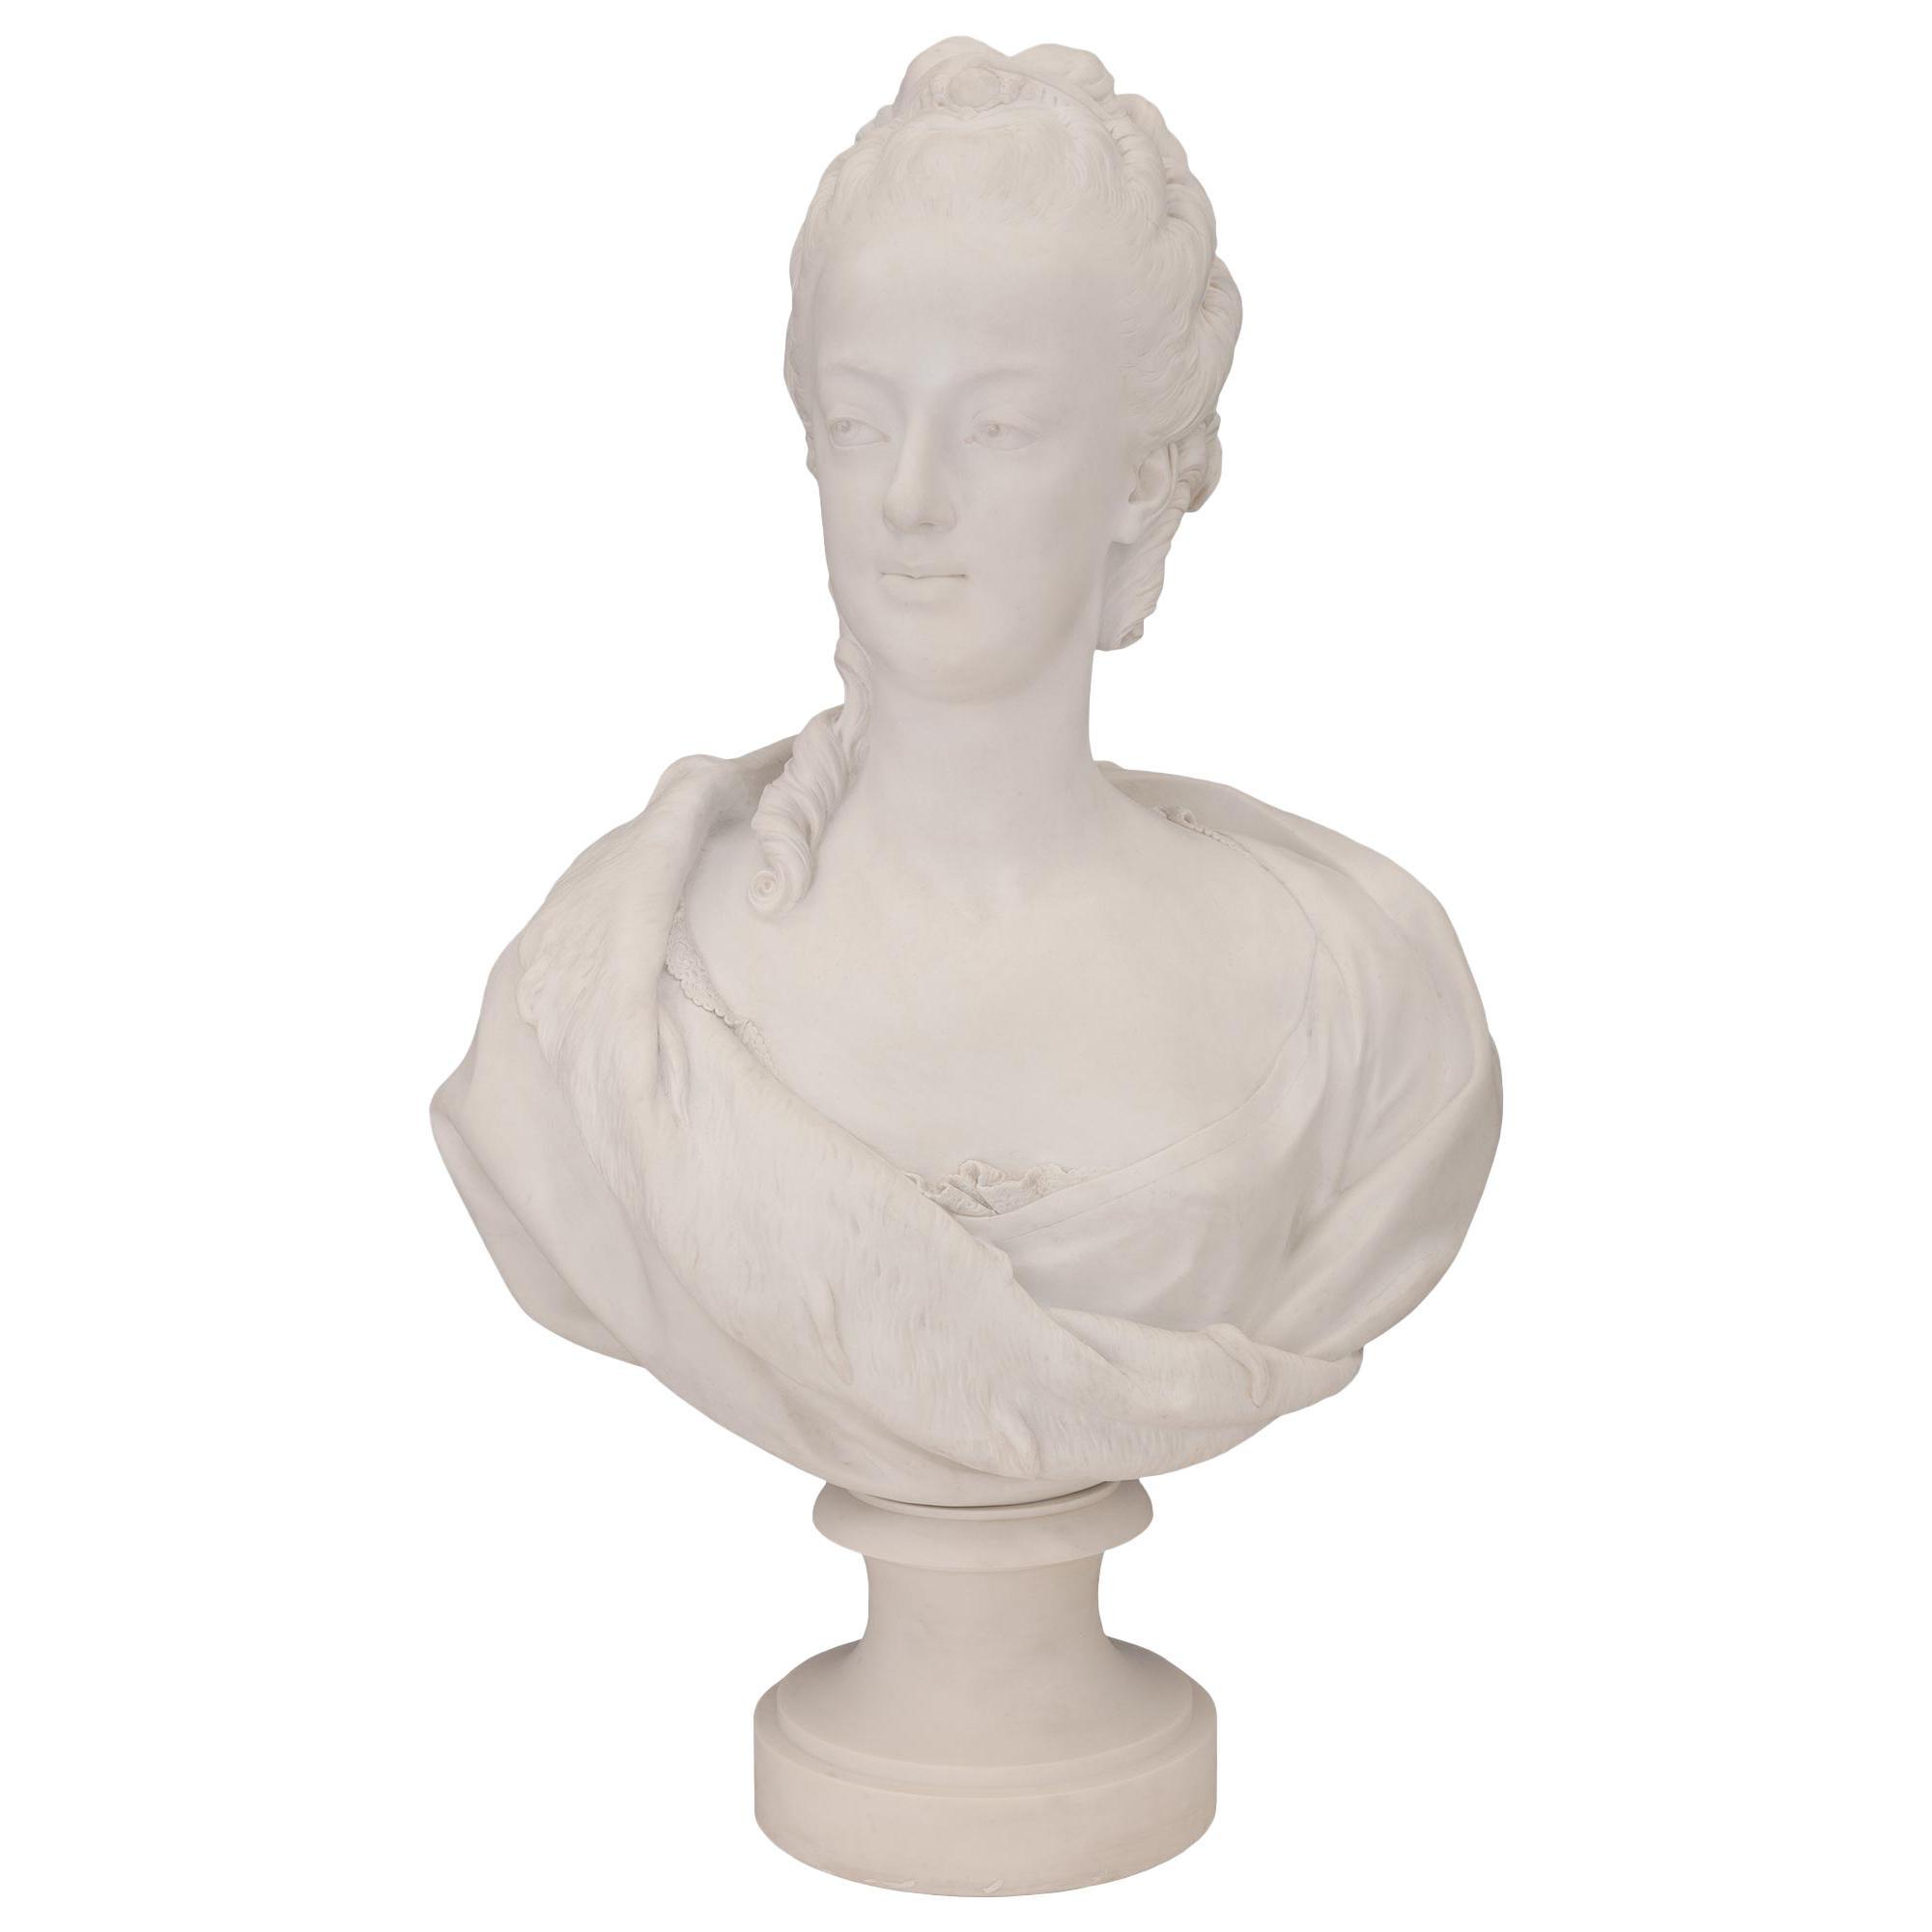 French 19th Century Louis XVI St. Porcelain Bust of Marie Antoinette